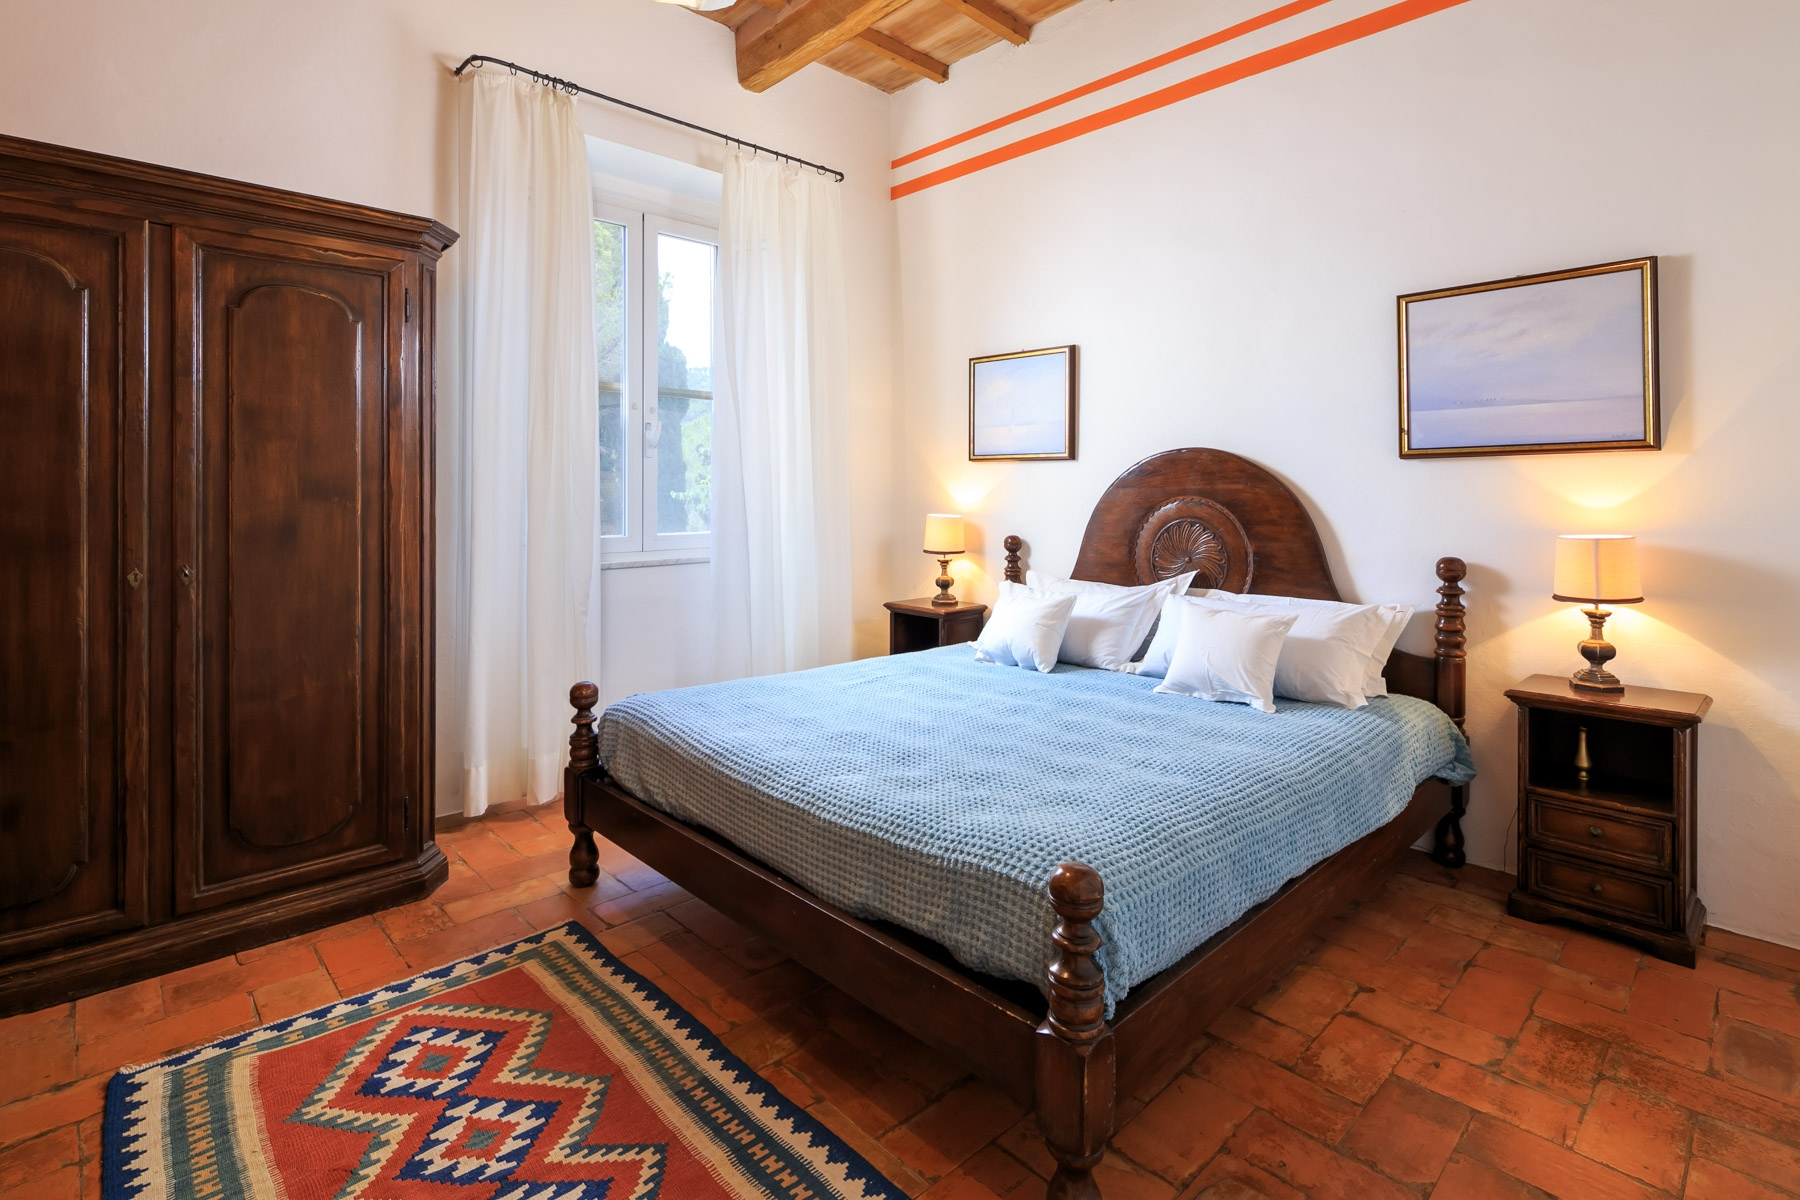 Villa in Vendita a Campiglia Marittima: 5 locali, 1100 mq - Foto 17